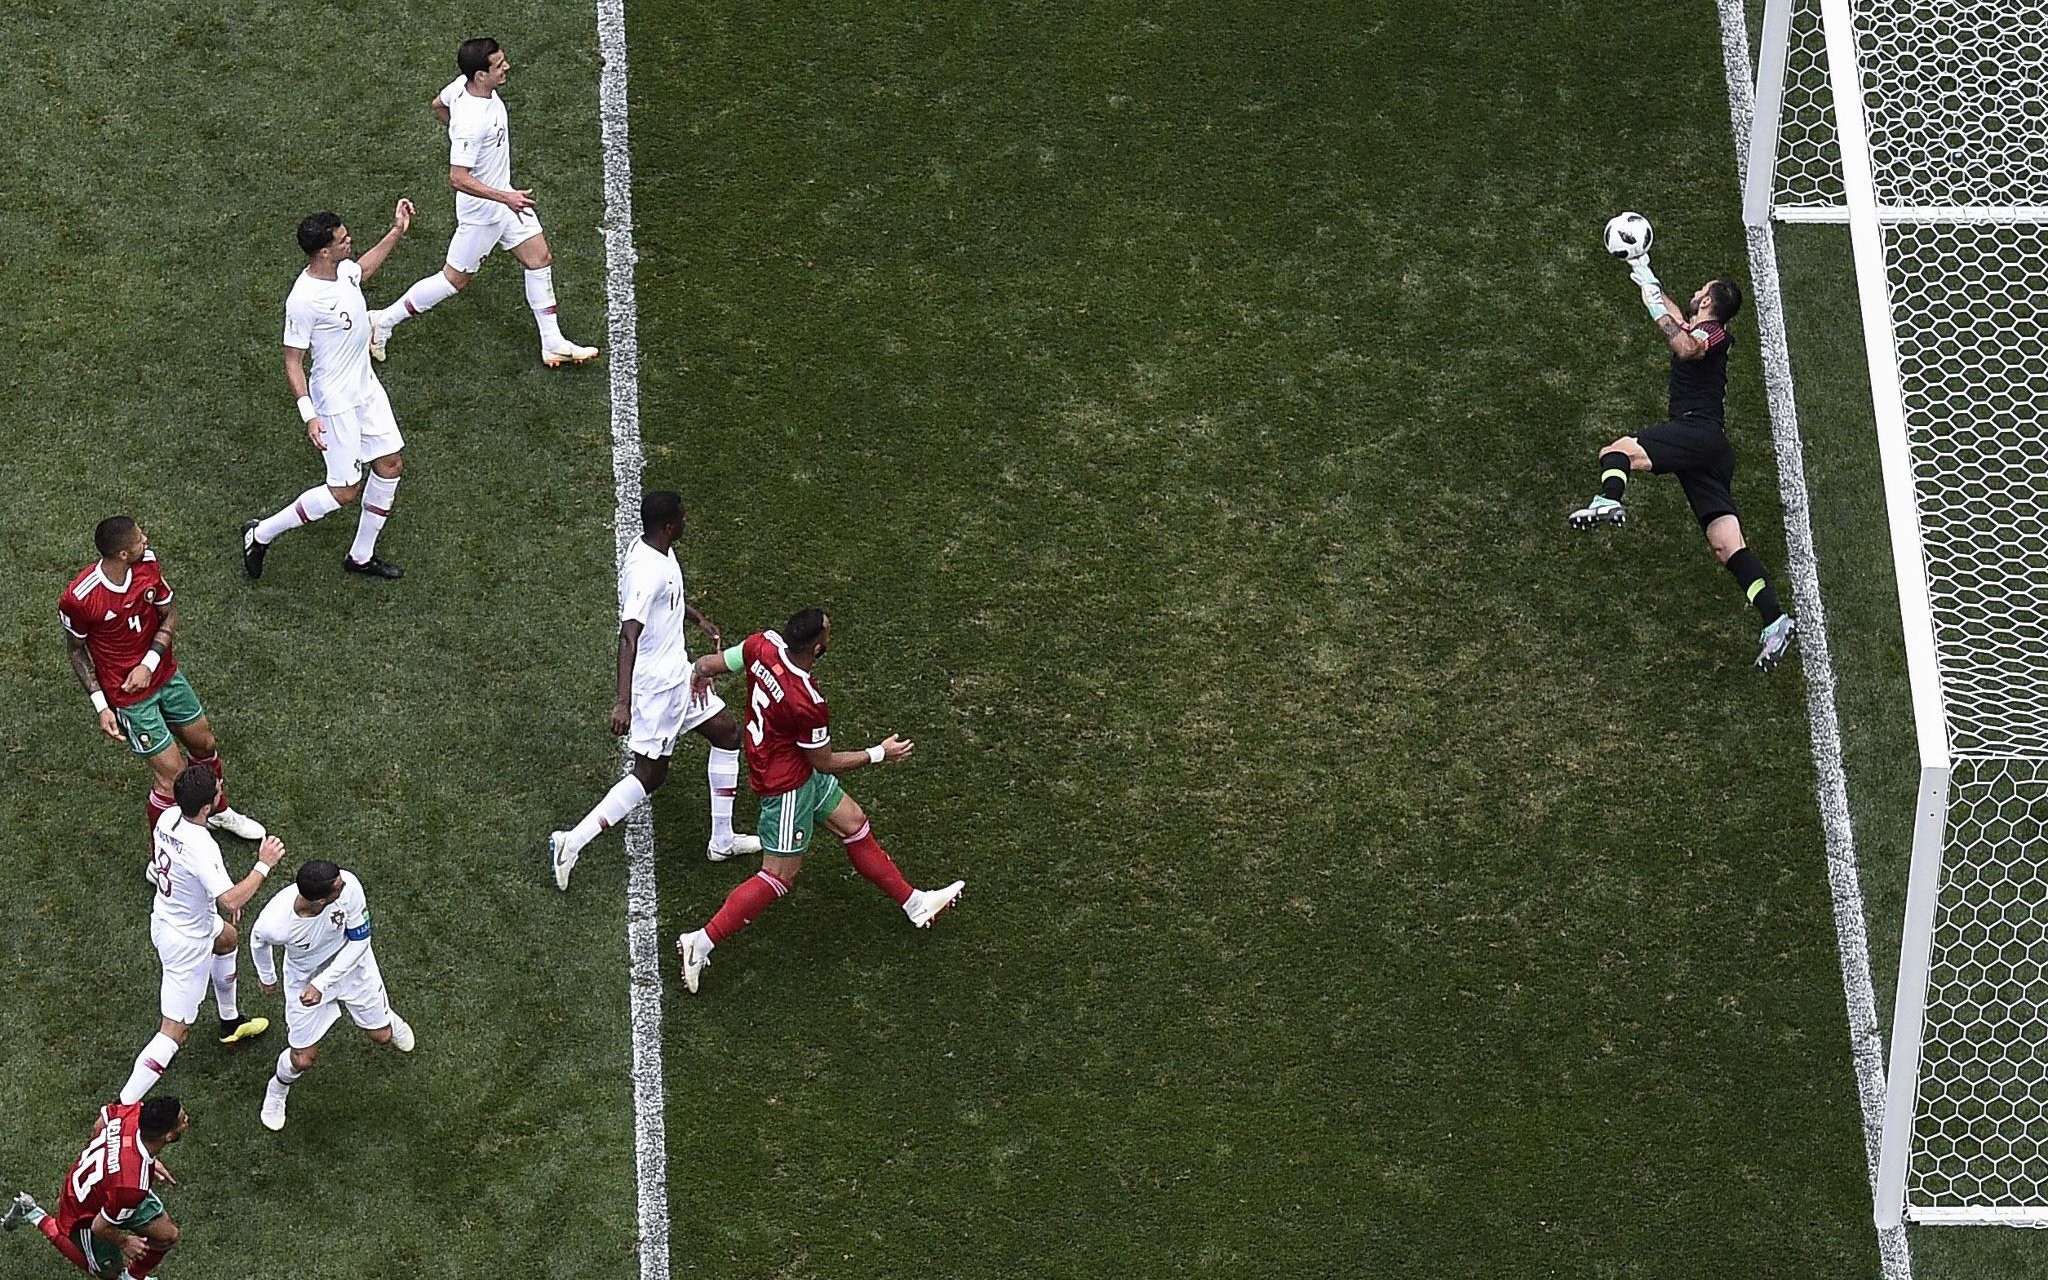 São Patrício ��️�� #WorldCup https://t.co/dKIK88b0ar